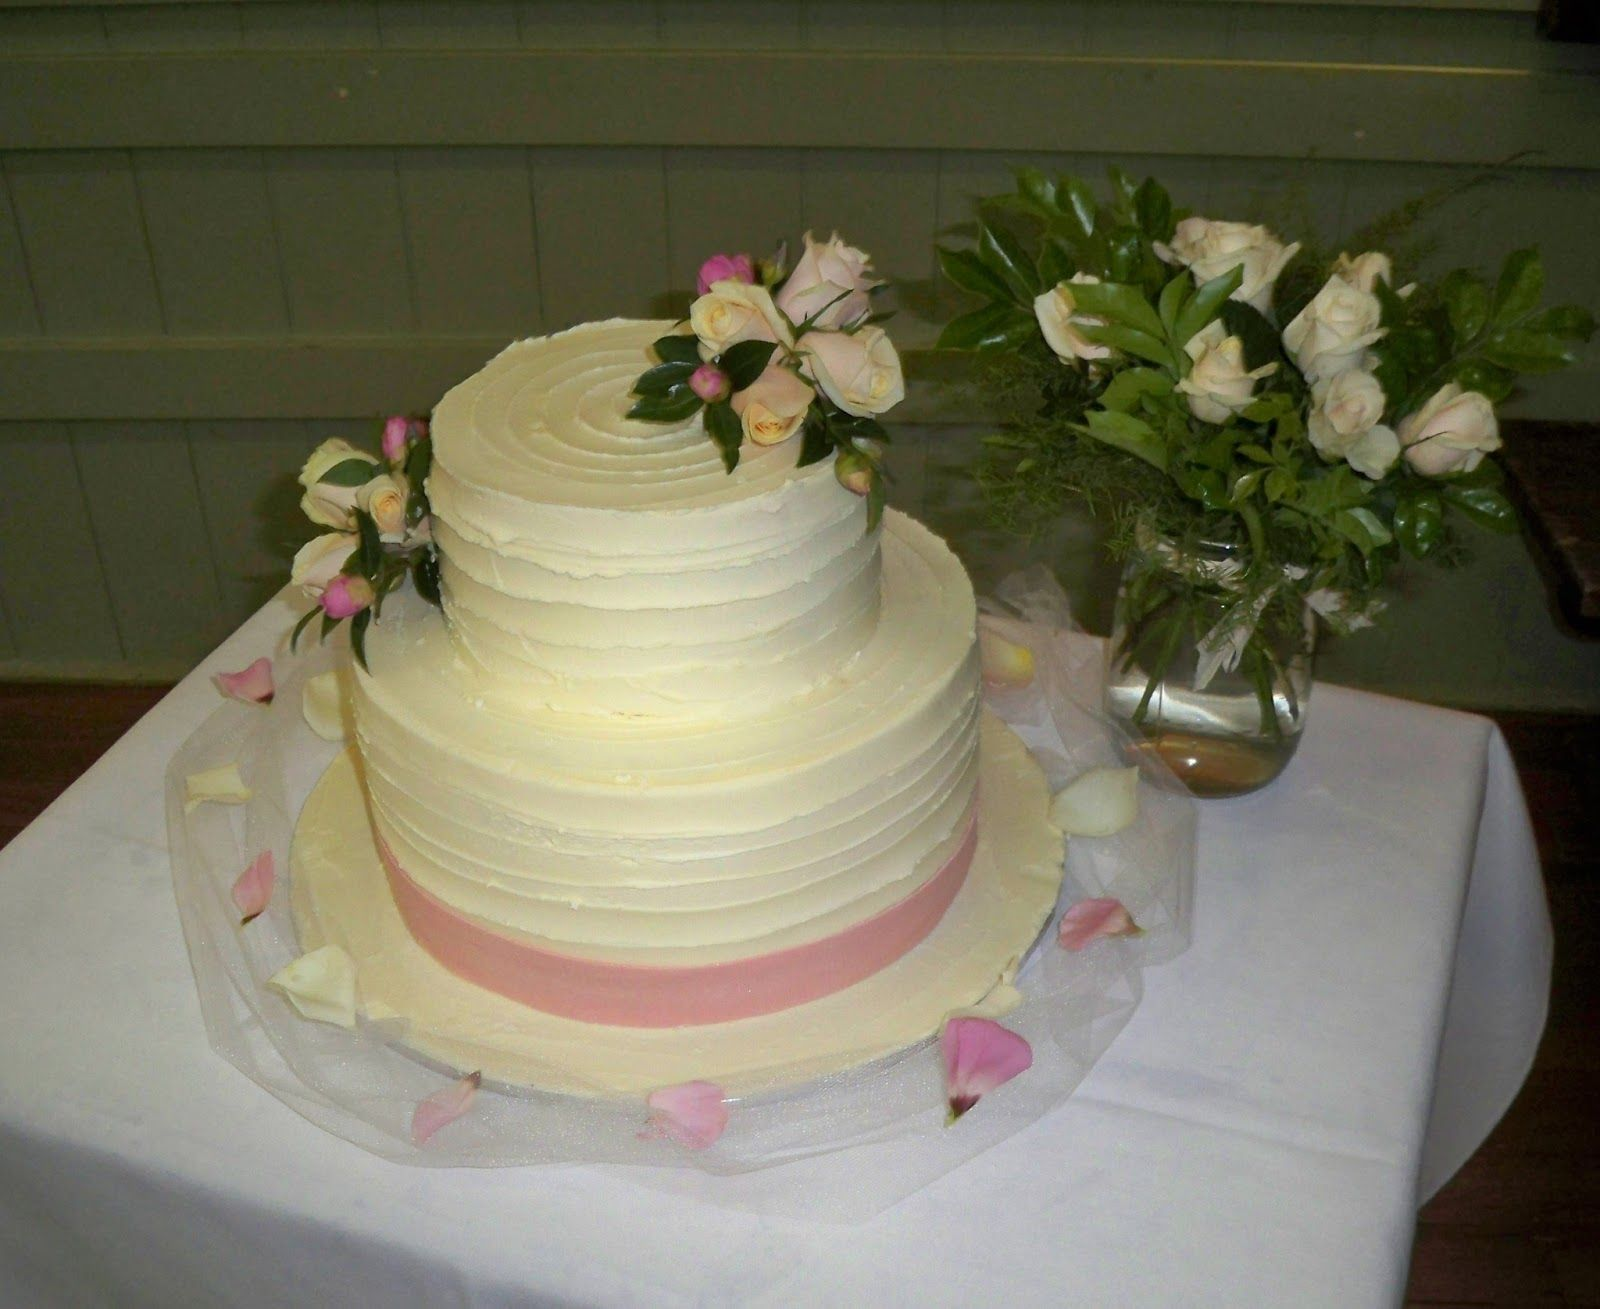 Single tier wedding cakes simple tier textured chocolate ganache